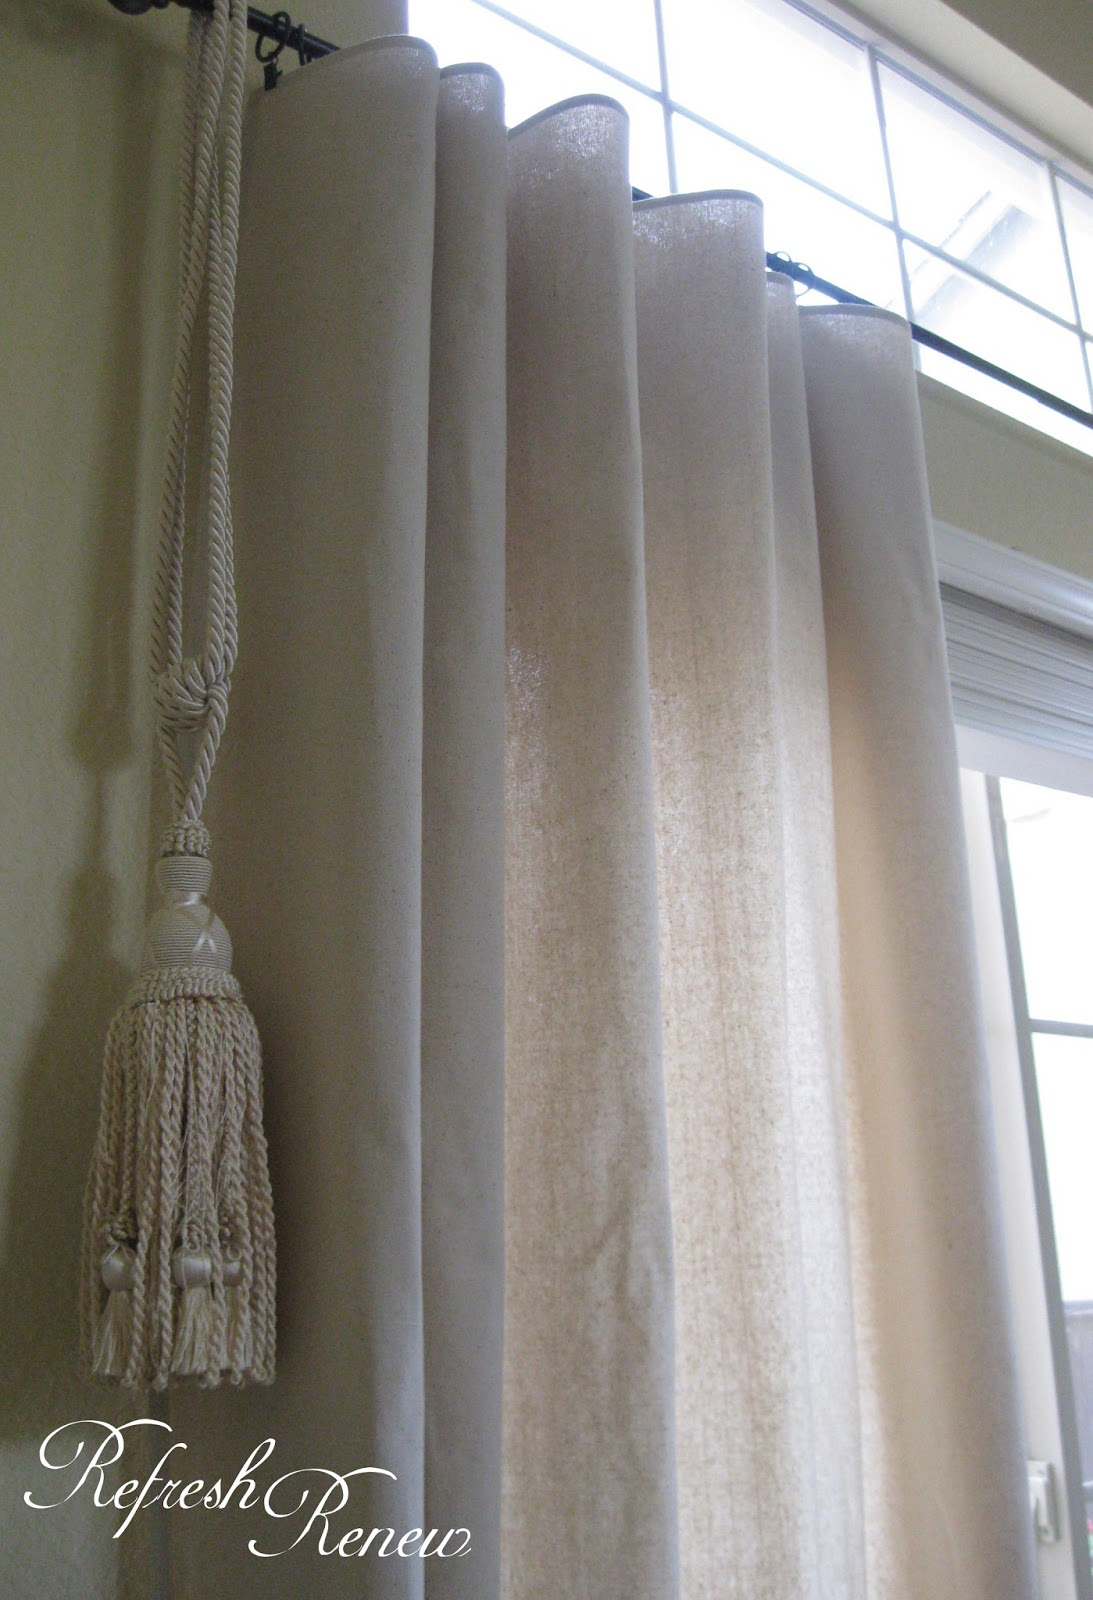 Refresh renew stylish window treatments for under 150 - Stylish window treatments ...